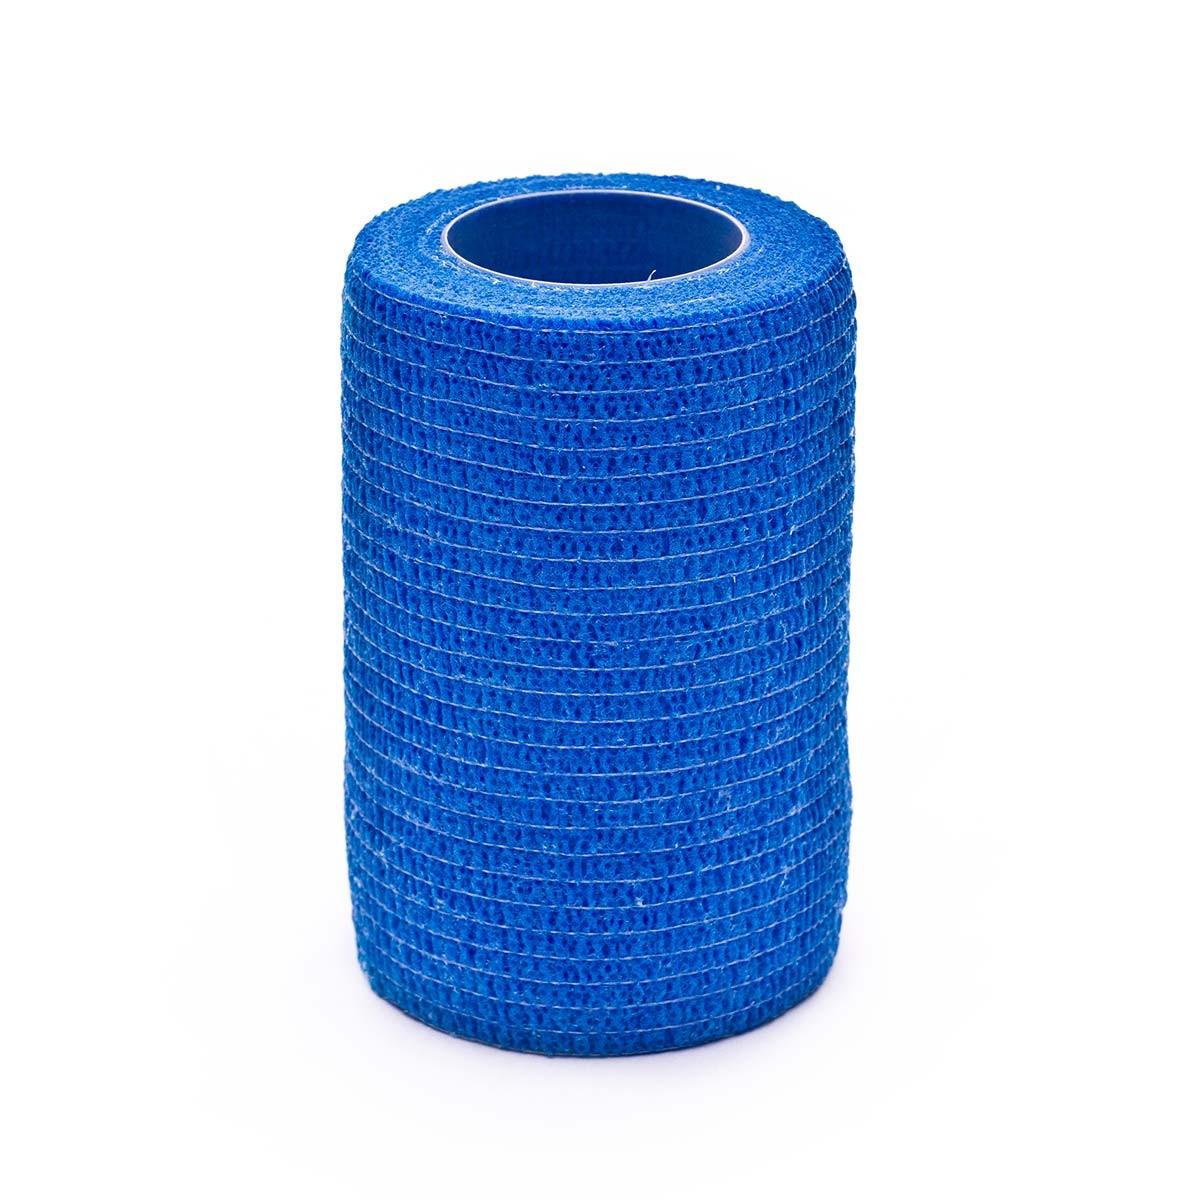 limpiar vestir leninismo  Tape SP Fútbol sujeta espinilleras 7,5cmX4,6m Azul royal - Tienda de fútbol  Fútbol Emotion